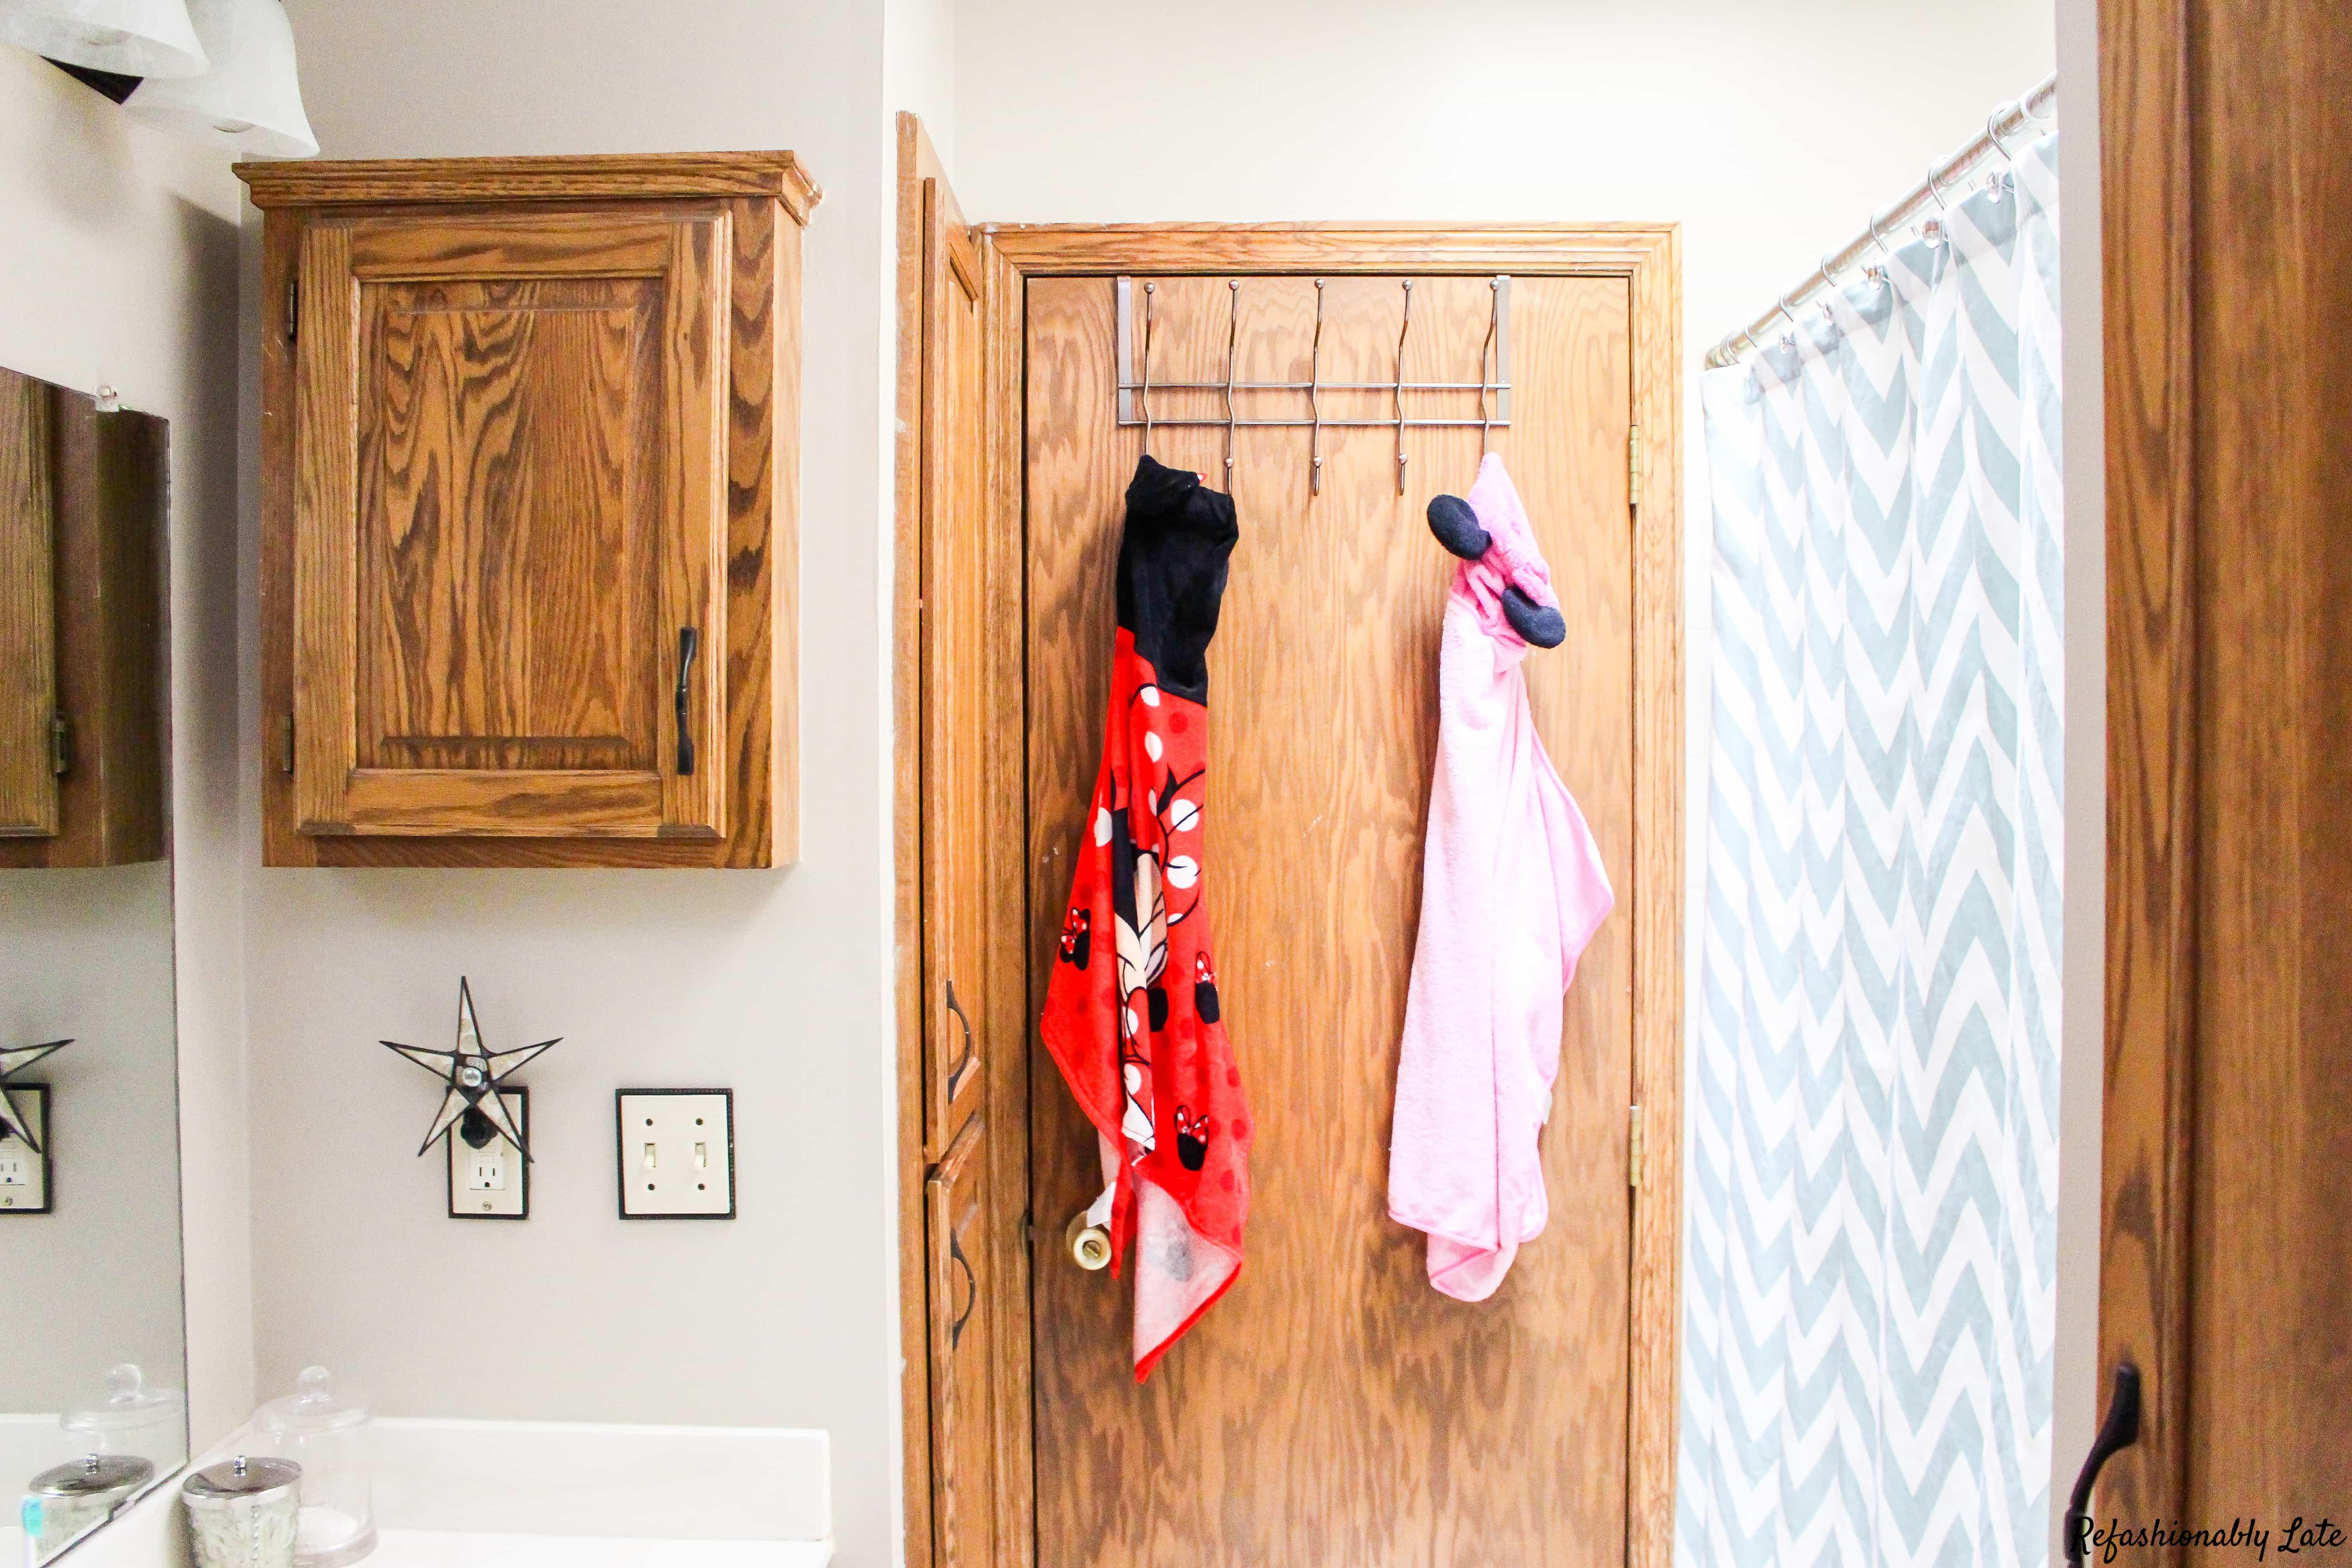 One Room Challenge Bathroom - Week 1 - www.refashionablylate.com